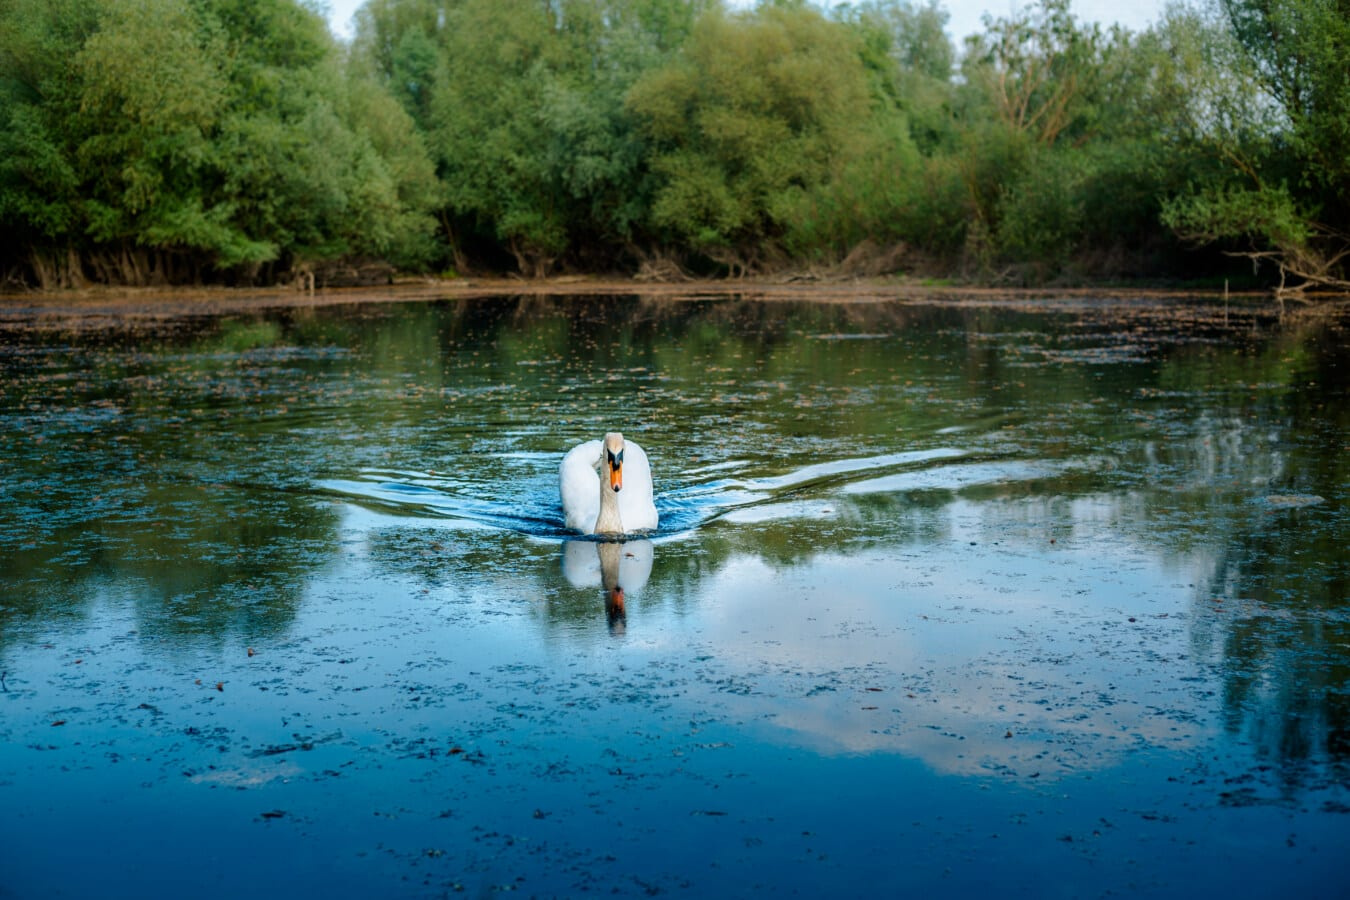 swamp, marshlands, swan, grace, bird, swimming, water, lake, reflection, river